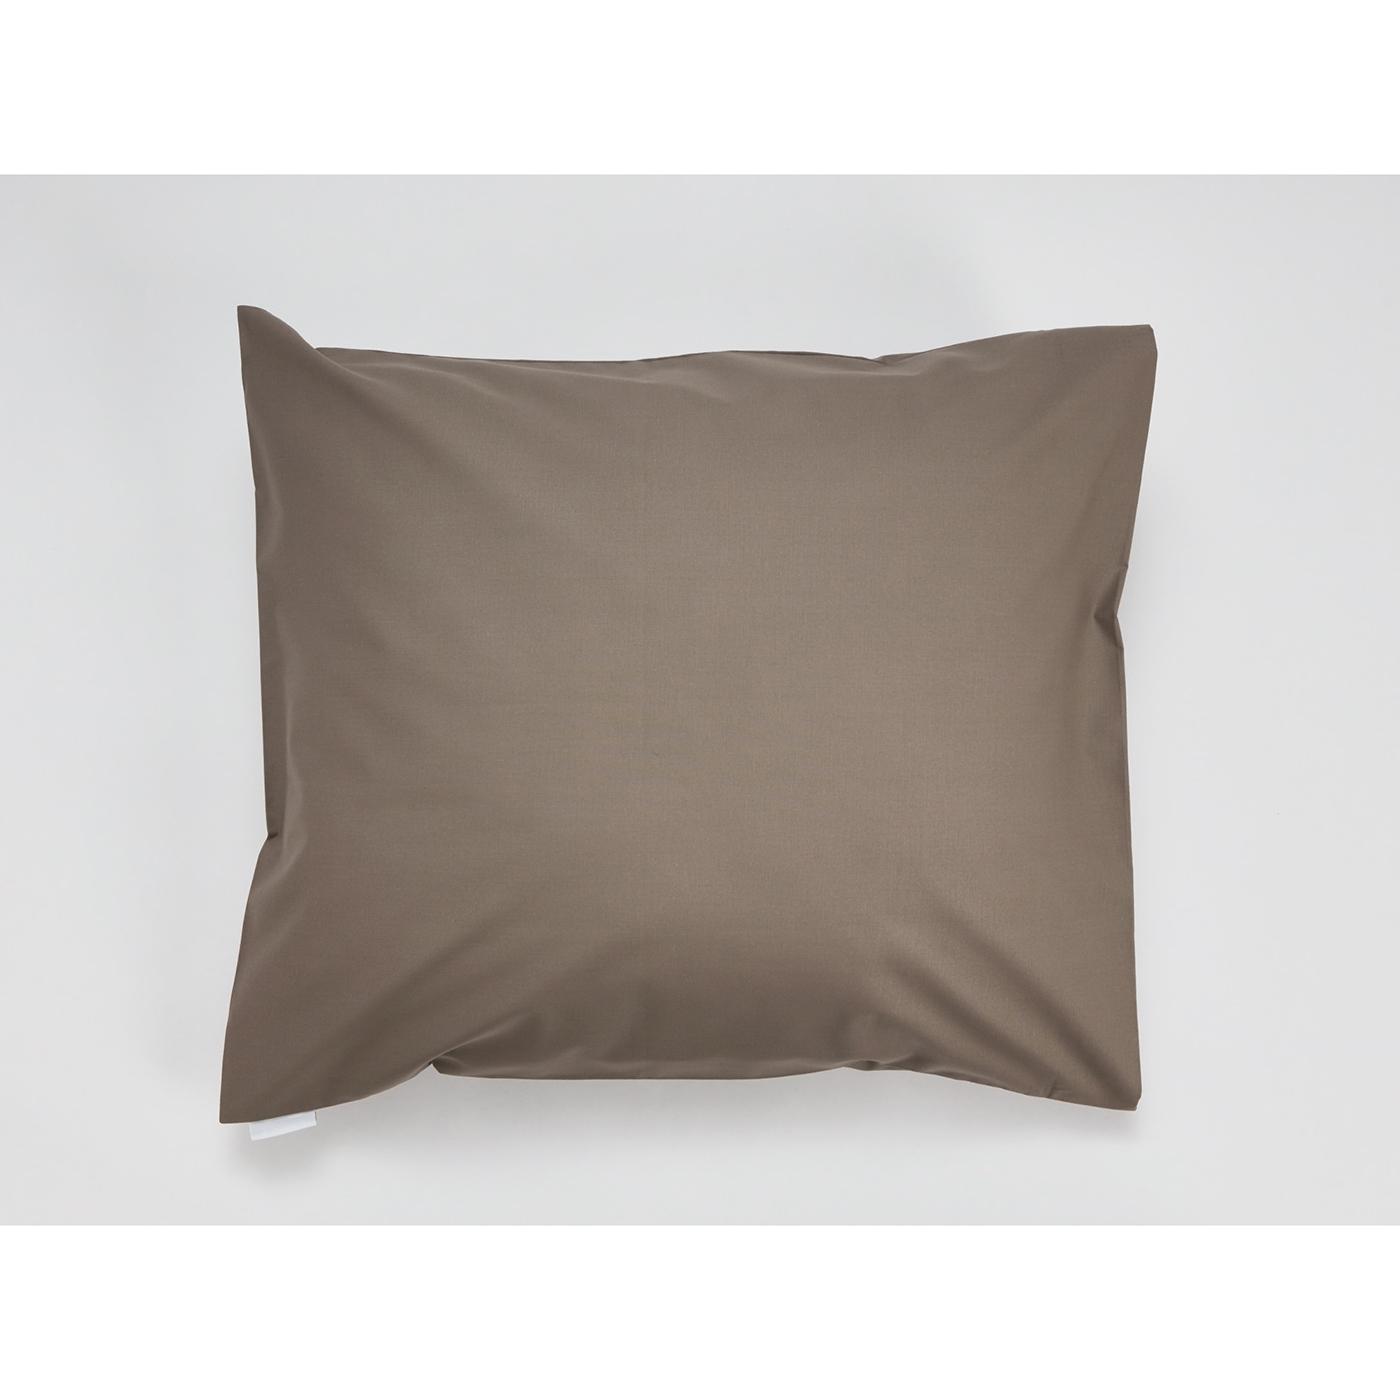 Snoooze cotton pillowcase (Mocha)